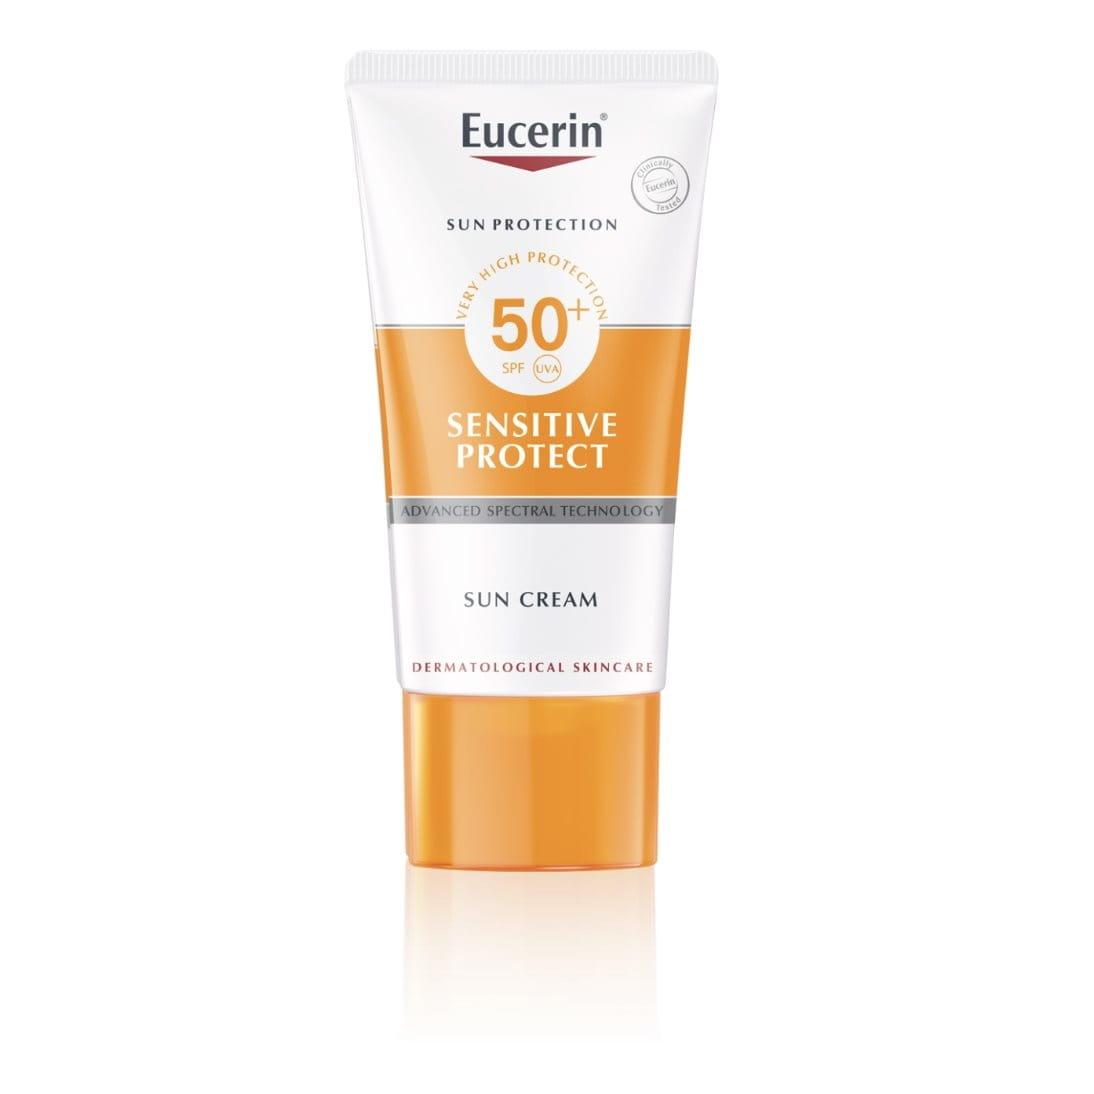 Sun Creme Sensitive Protect SPF 50+